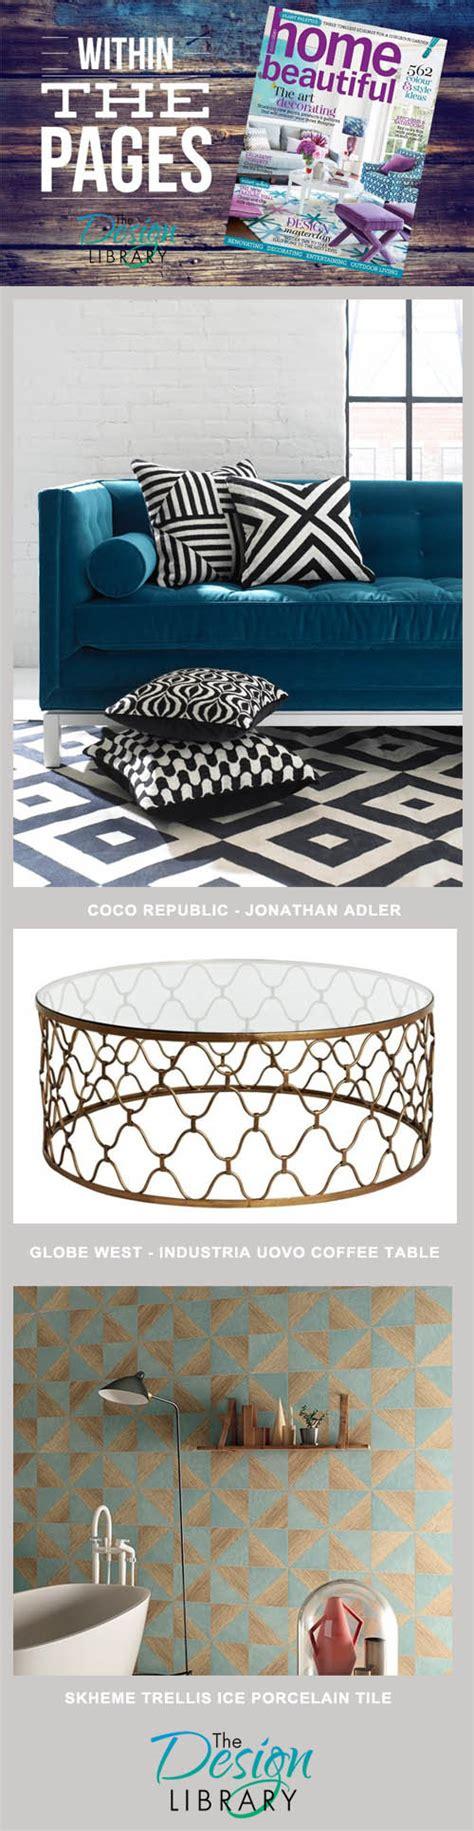 home design magazines 2015 interior design magazines home beautiful april 2015